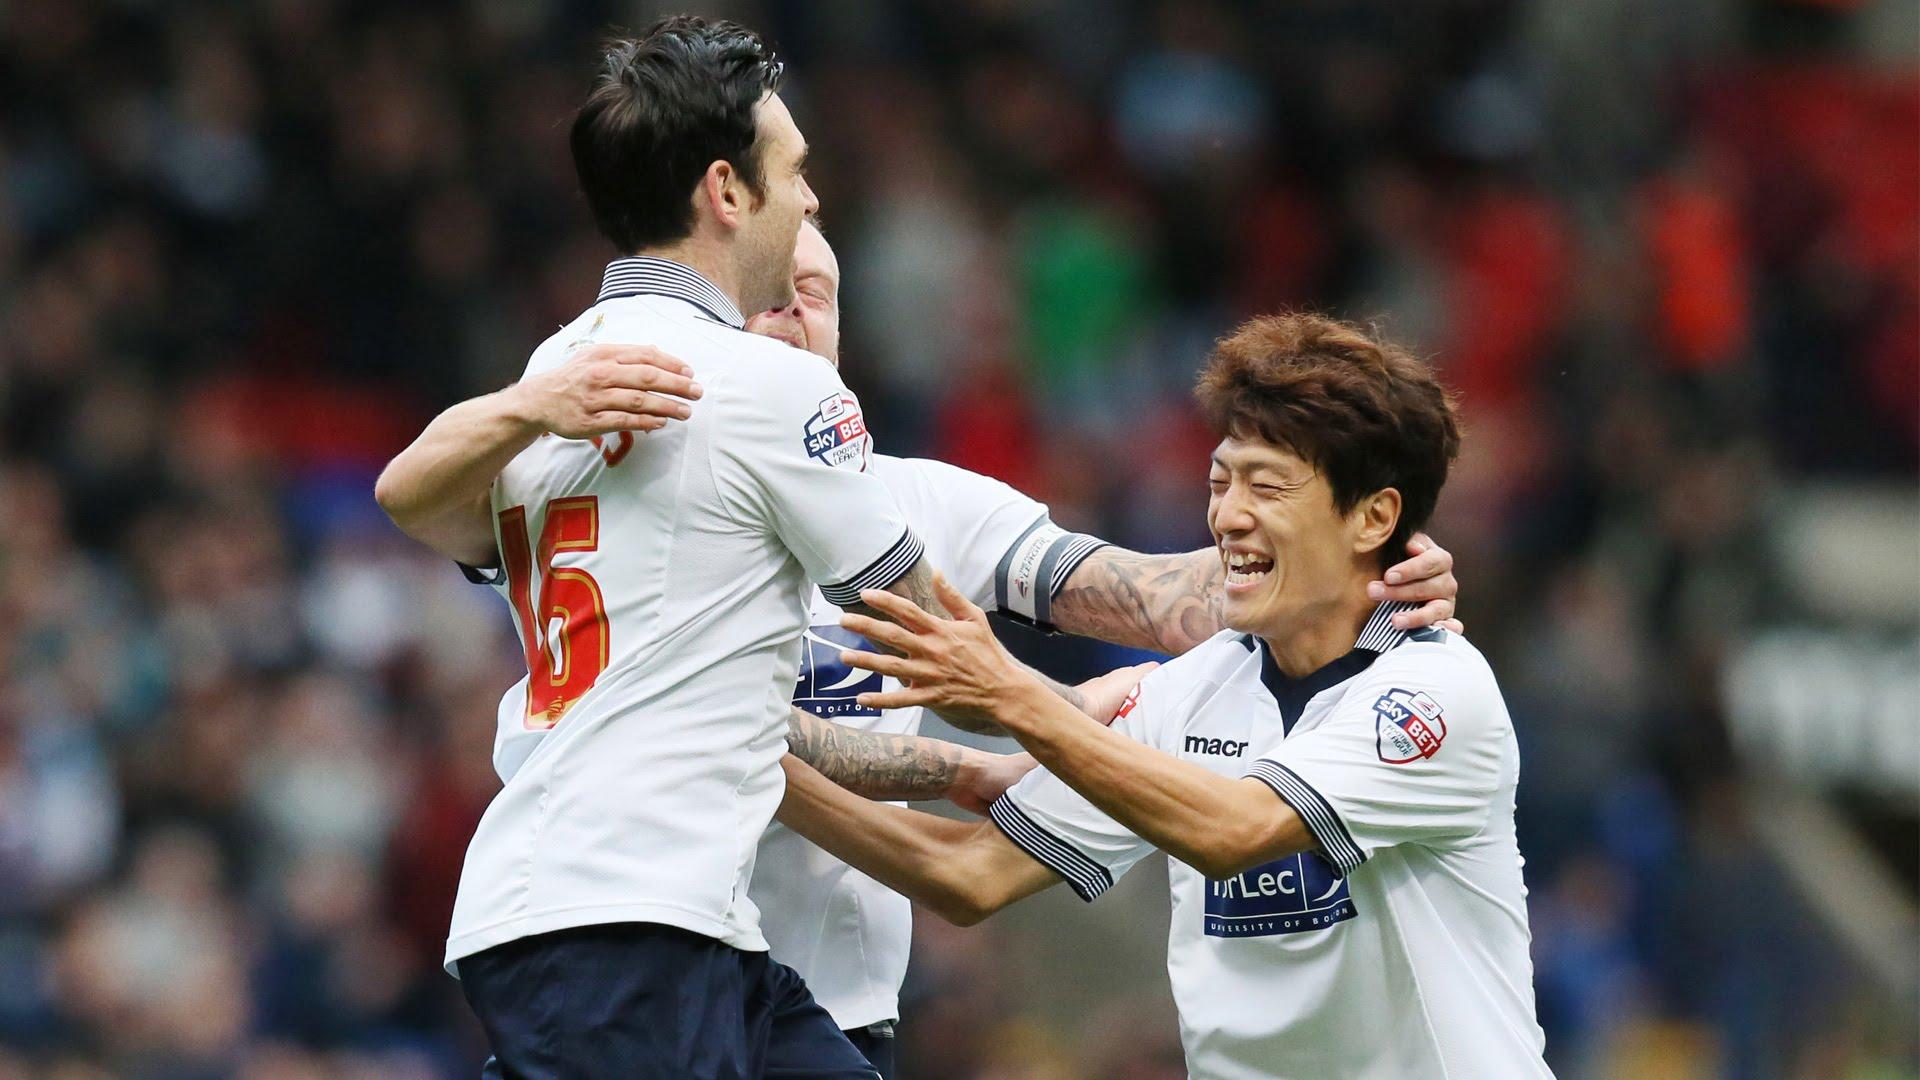 Ponturi pariuri – Bolton vs Brentford – Championship